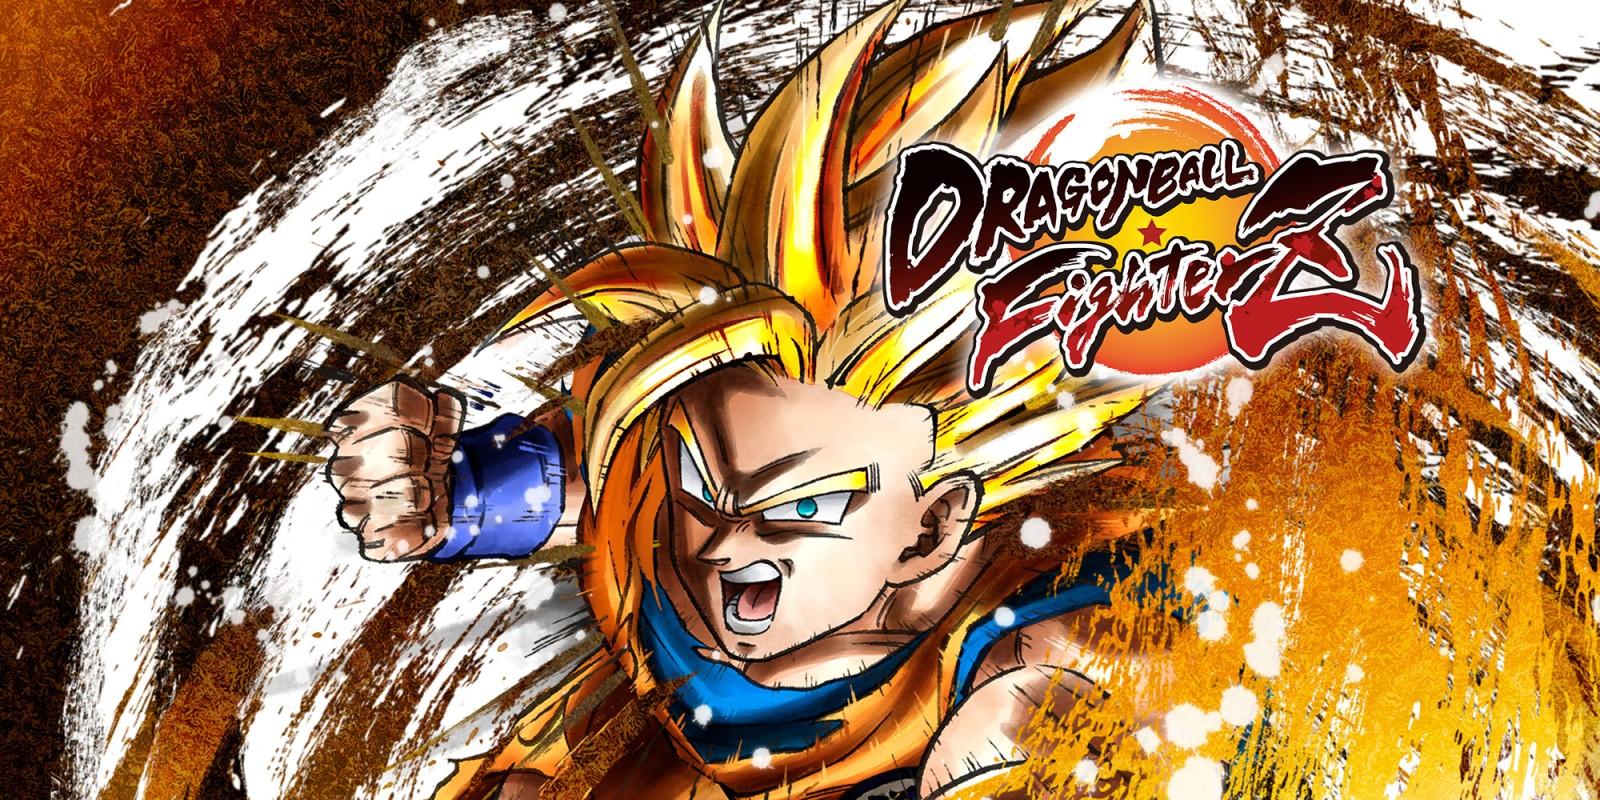 Dragon ball fighterz nintendo switch games nintendo - Image dragon ball z gratuit ...